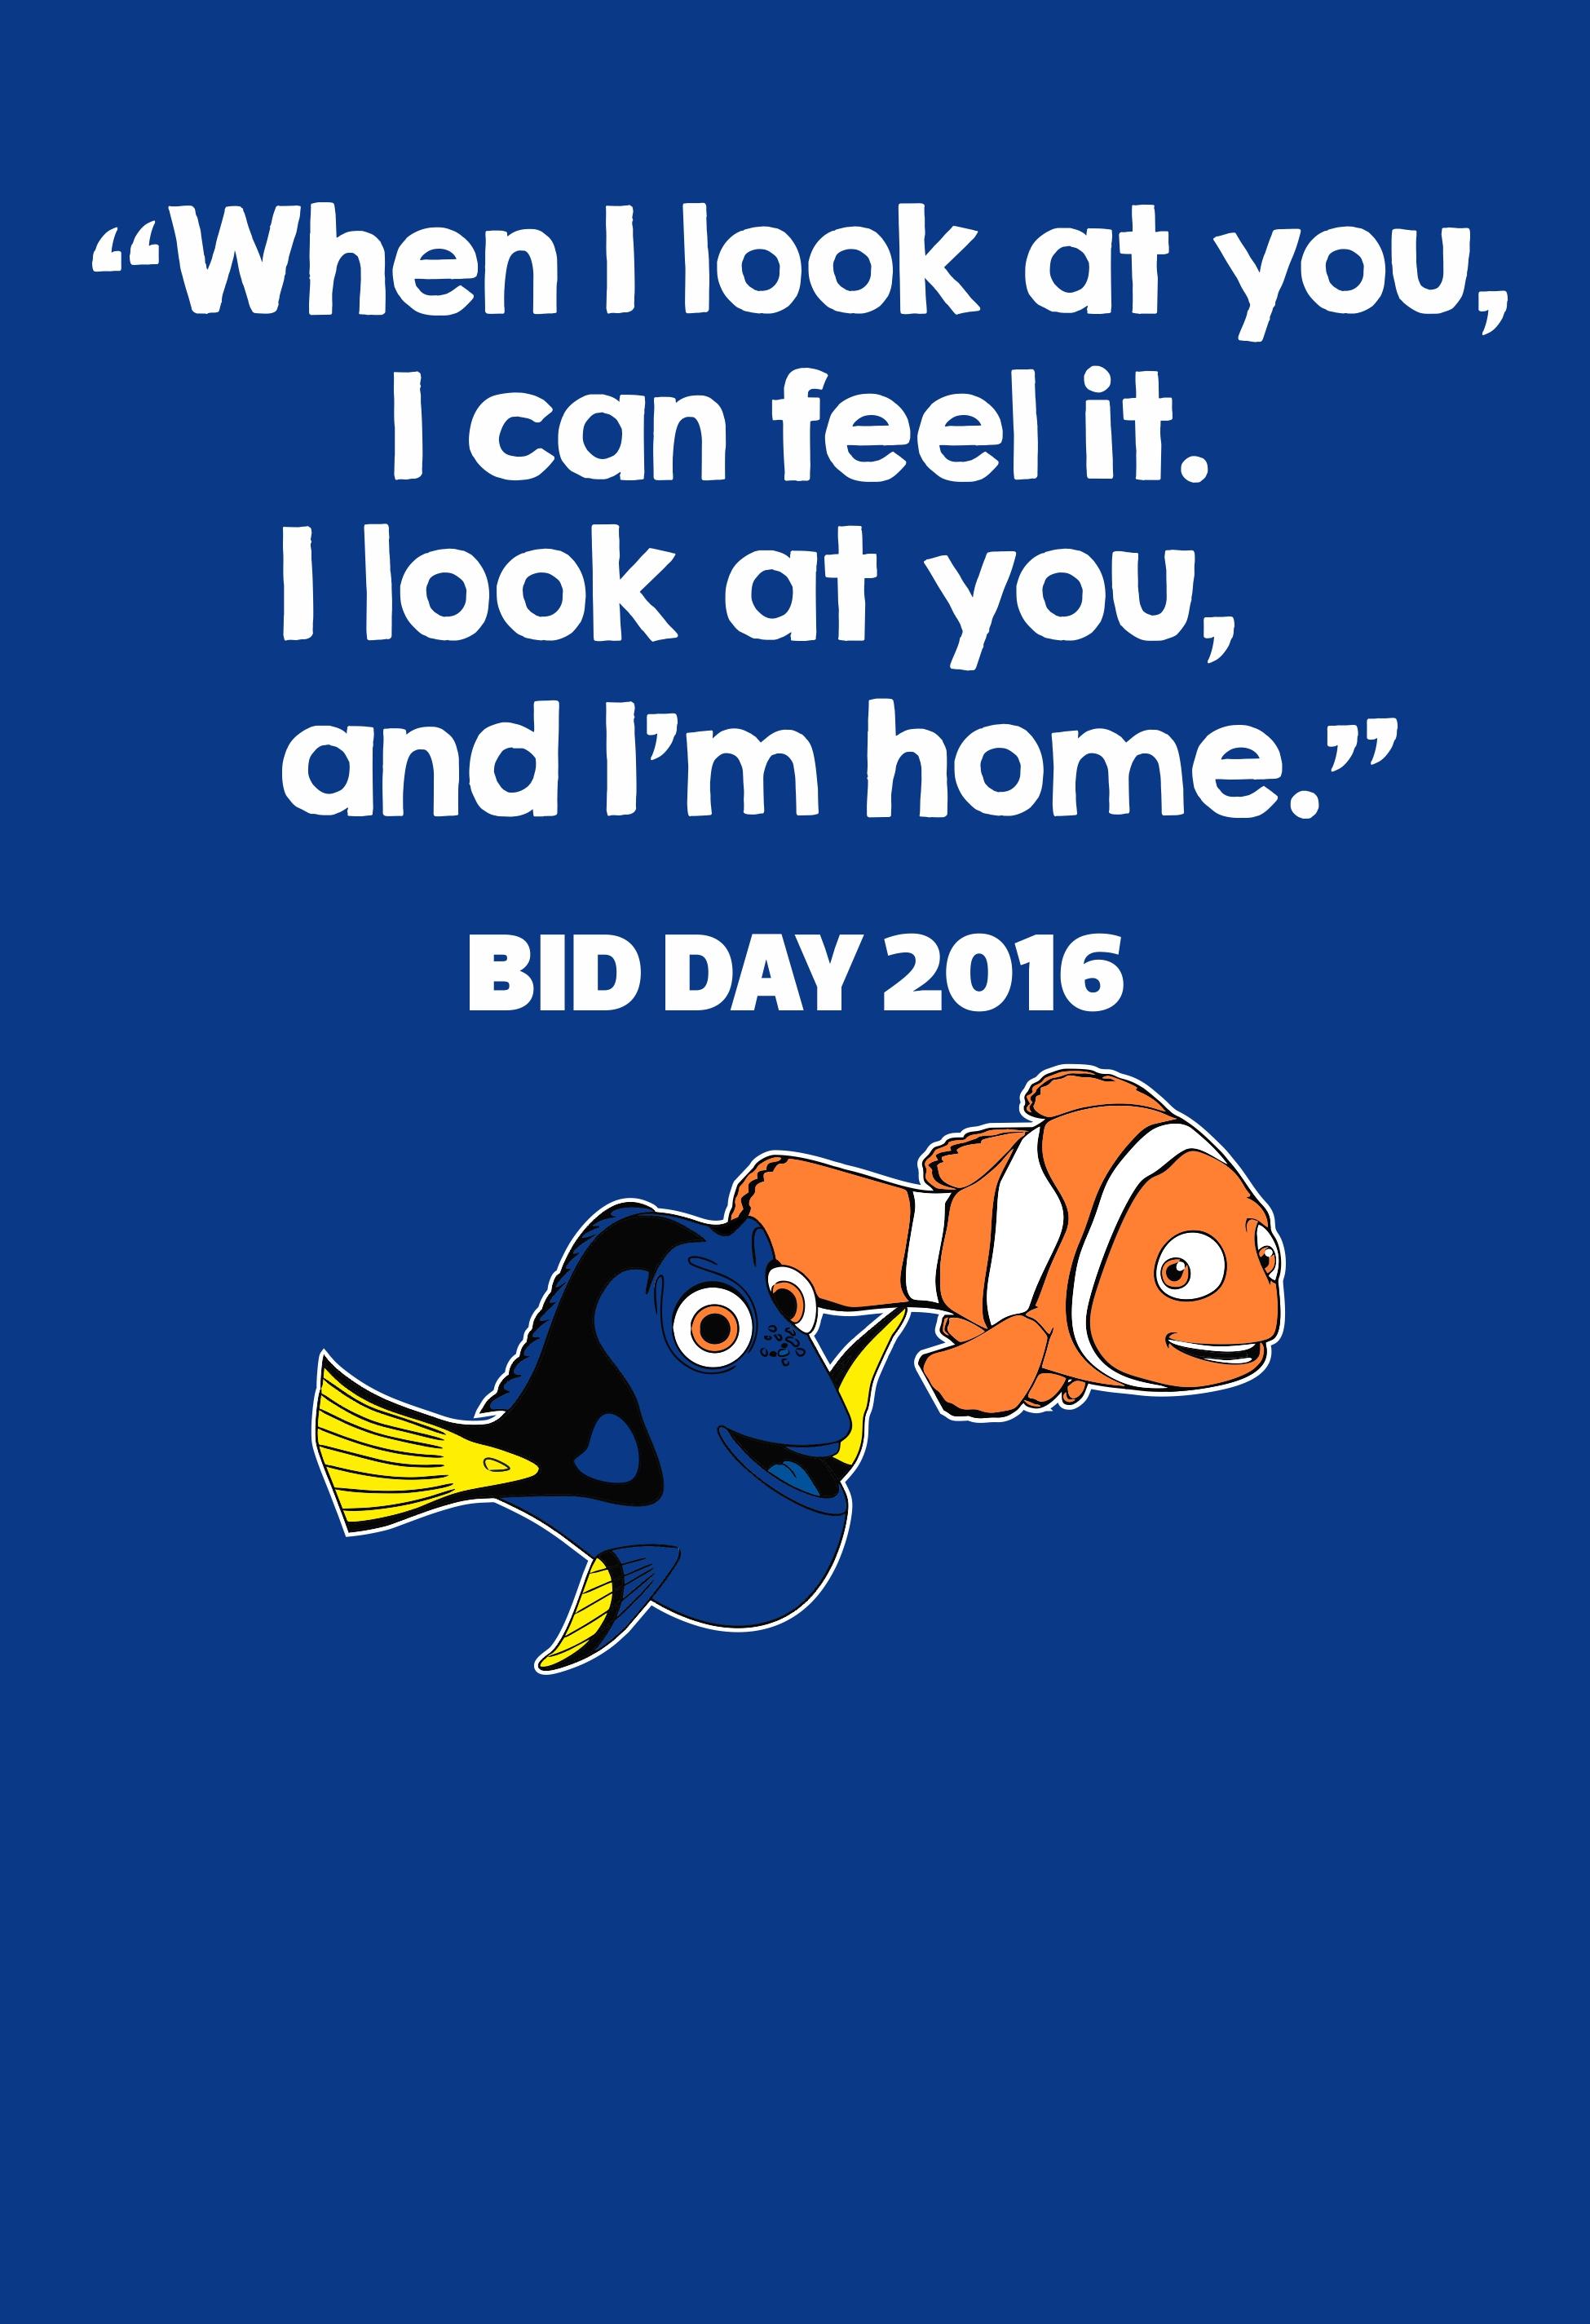 Finding Nemo themed screen print on a royal blue shirt